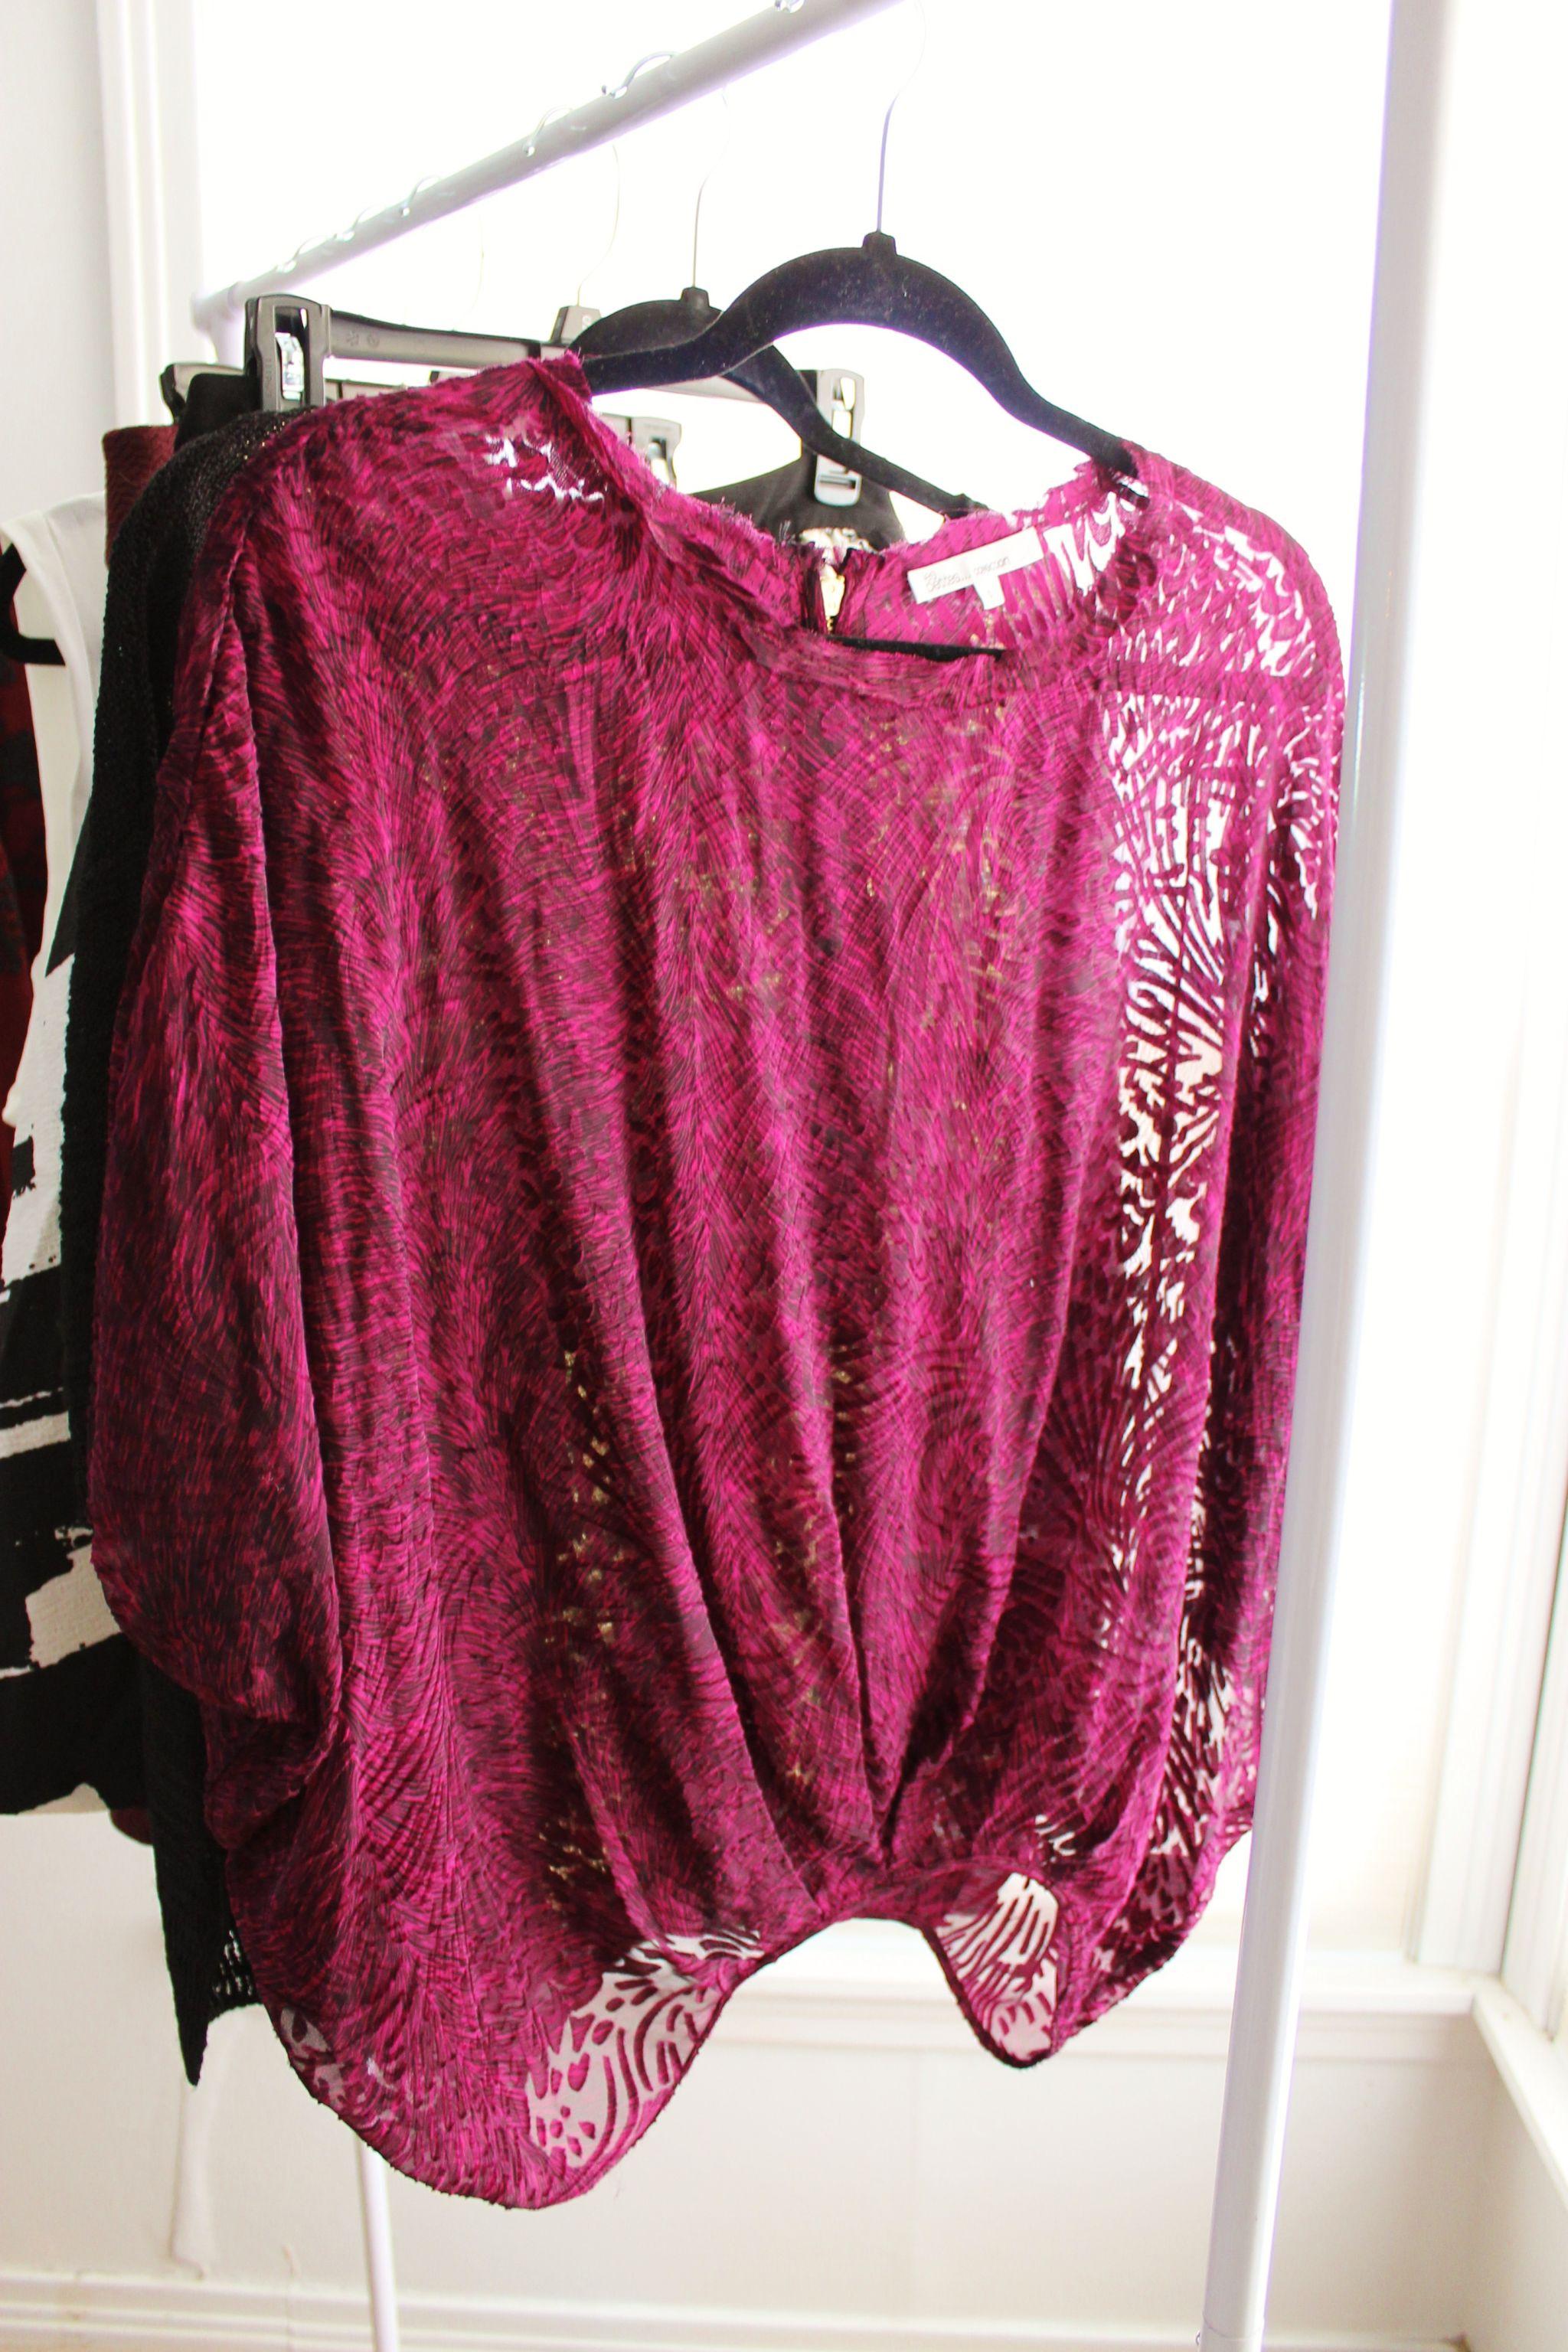 paris clothes pink top